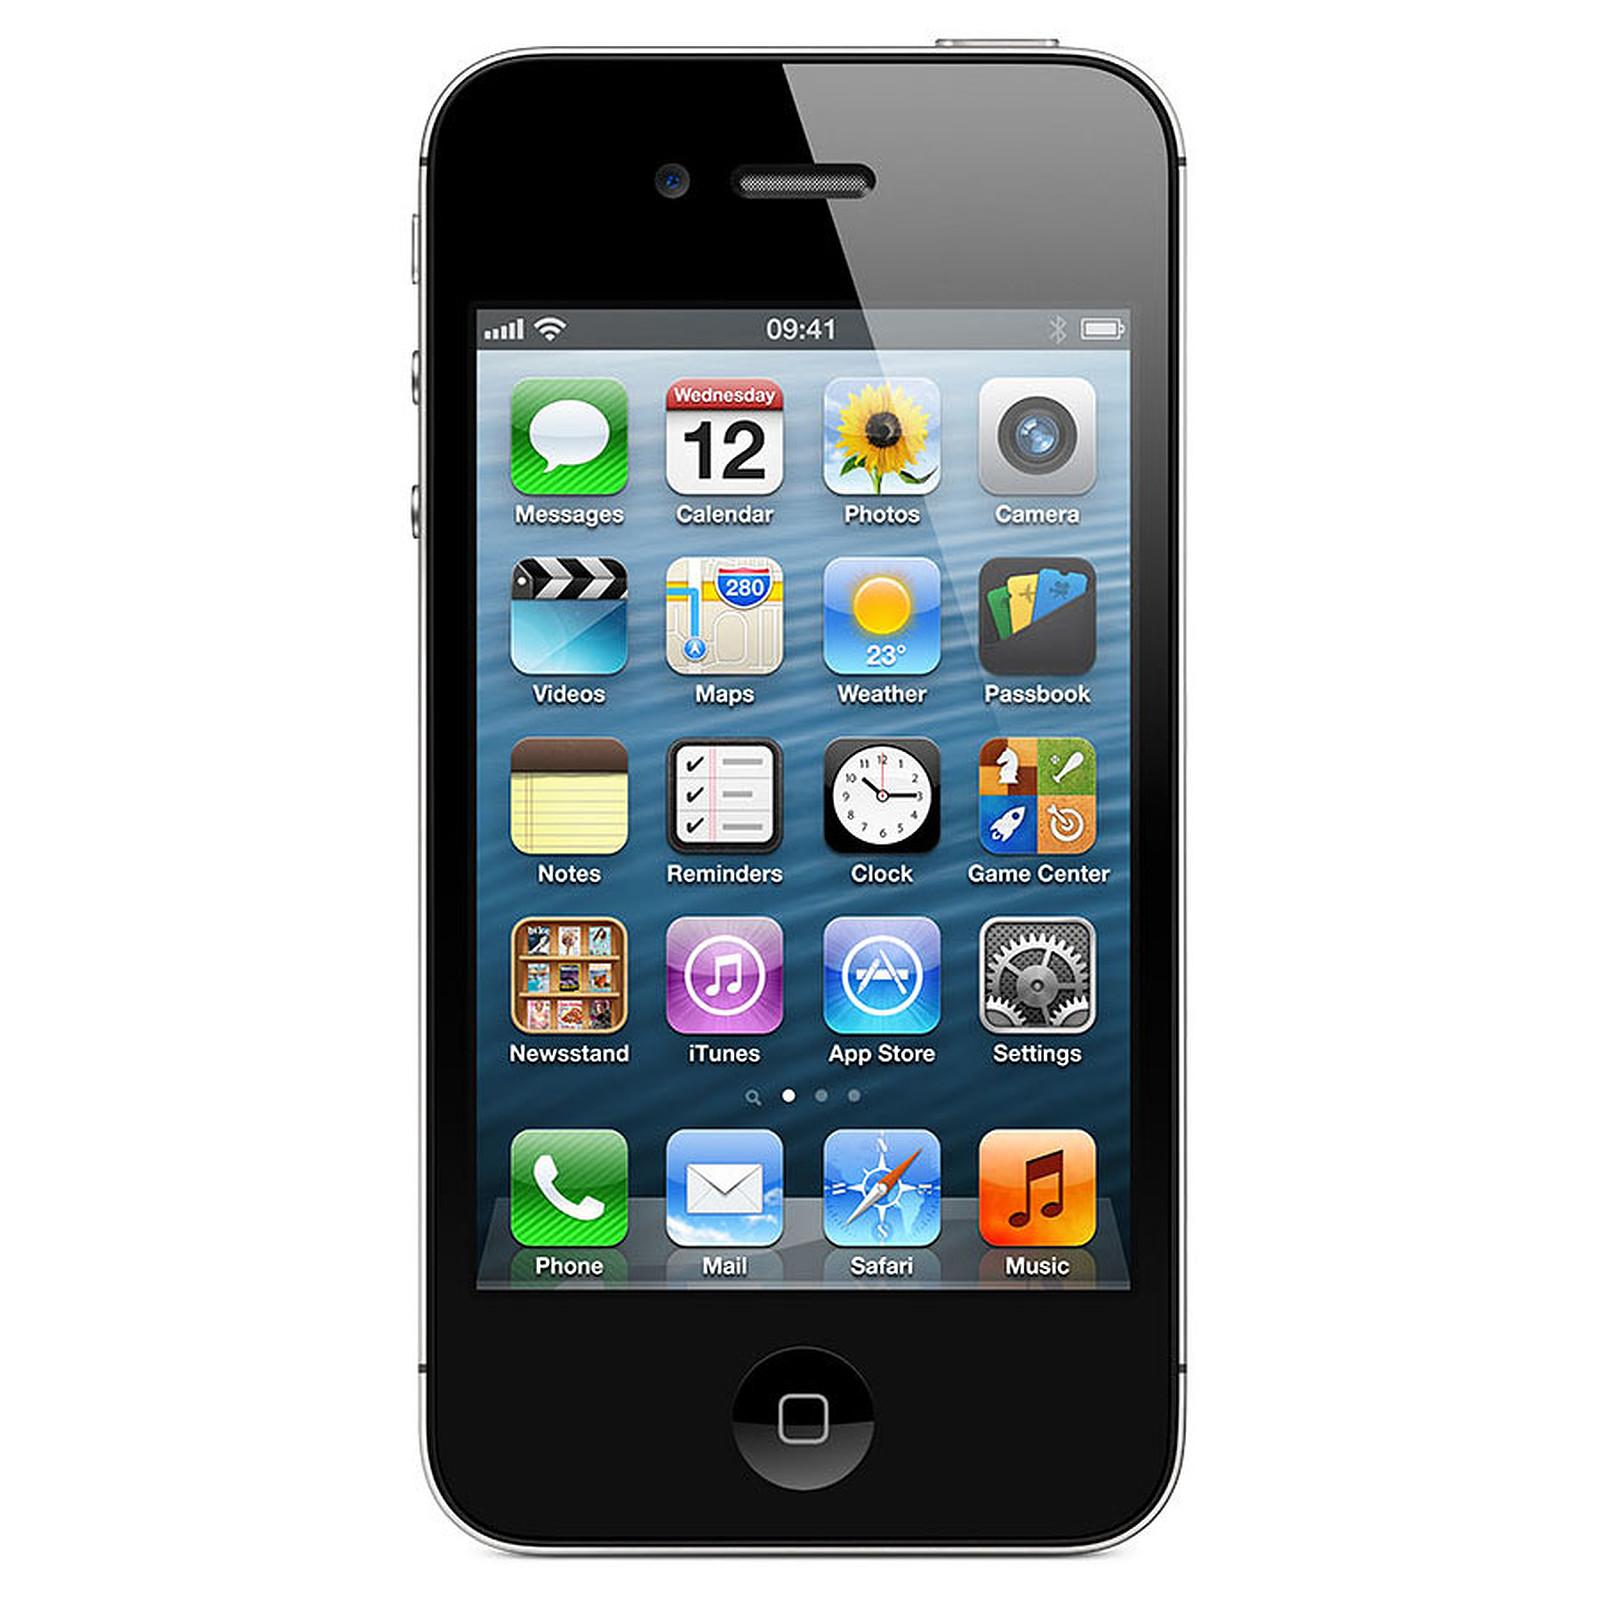 apple iphone 4s 8 go noir mobile smartphone apple sur. Black Bedroom Furniture Sets. Home Design Ideas